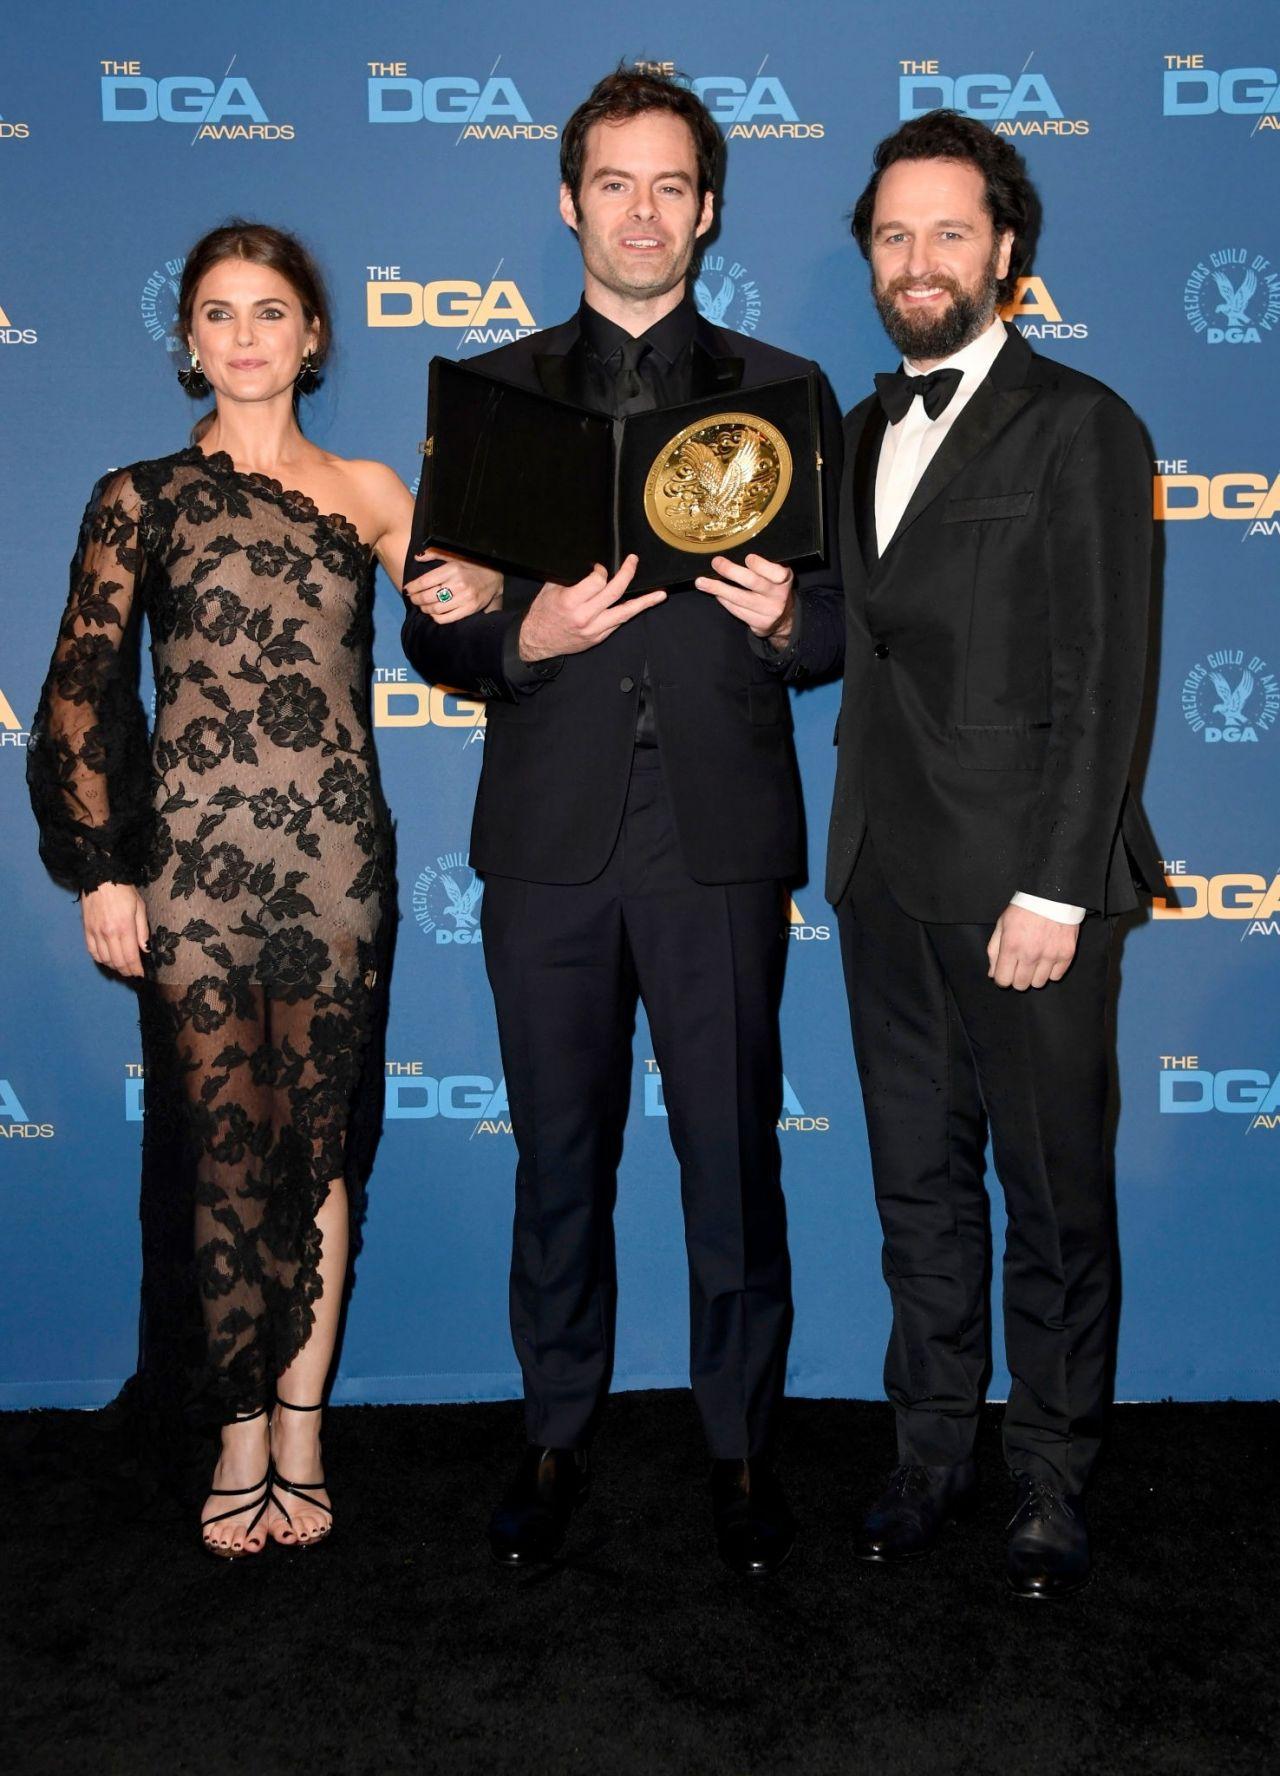 https://celebmafia.com/wp-content/uploads/2019/02/keri-russell-2019-directors-guild-of-america-awards-11.jpg